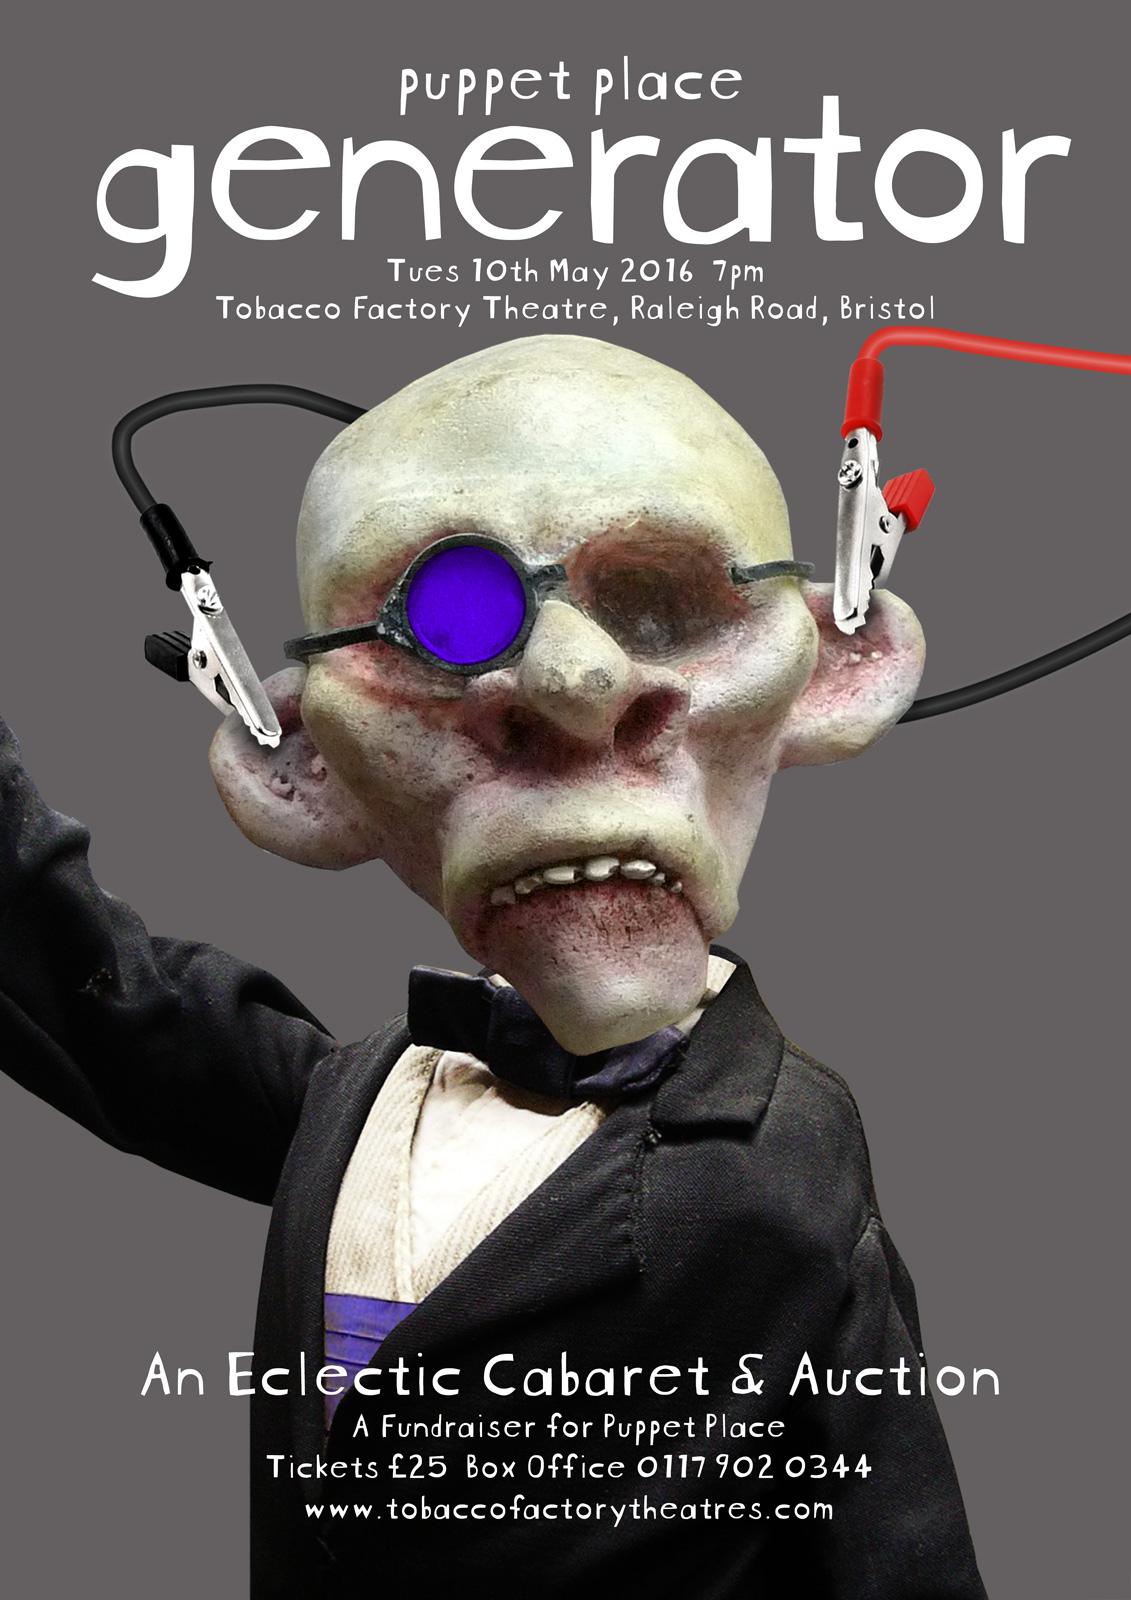 joemagee-puppetplace-GENERATOR-poster.jpg